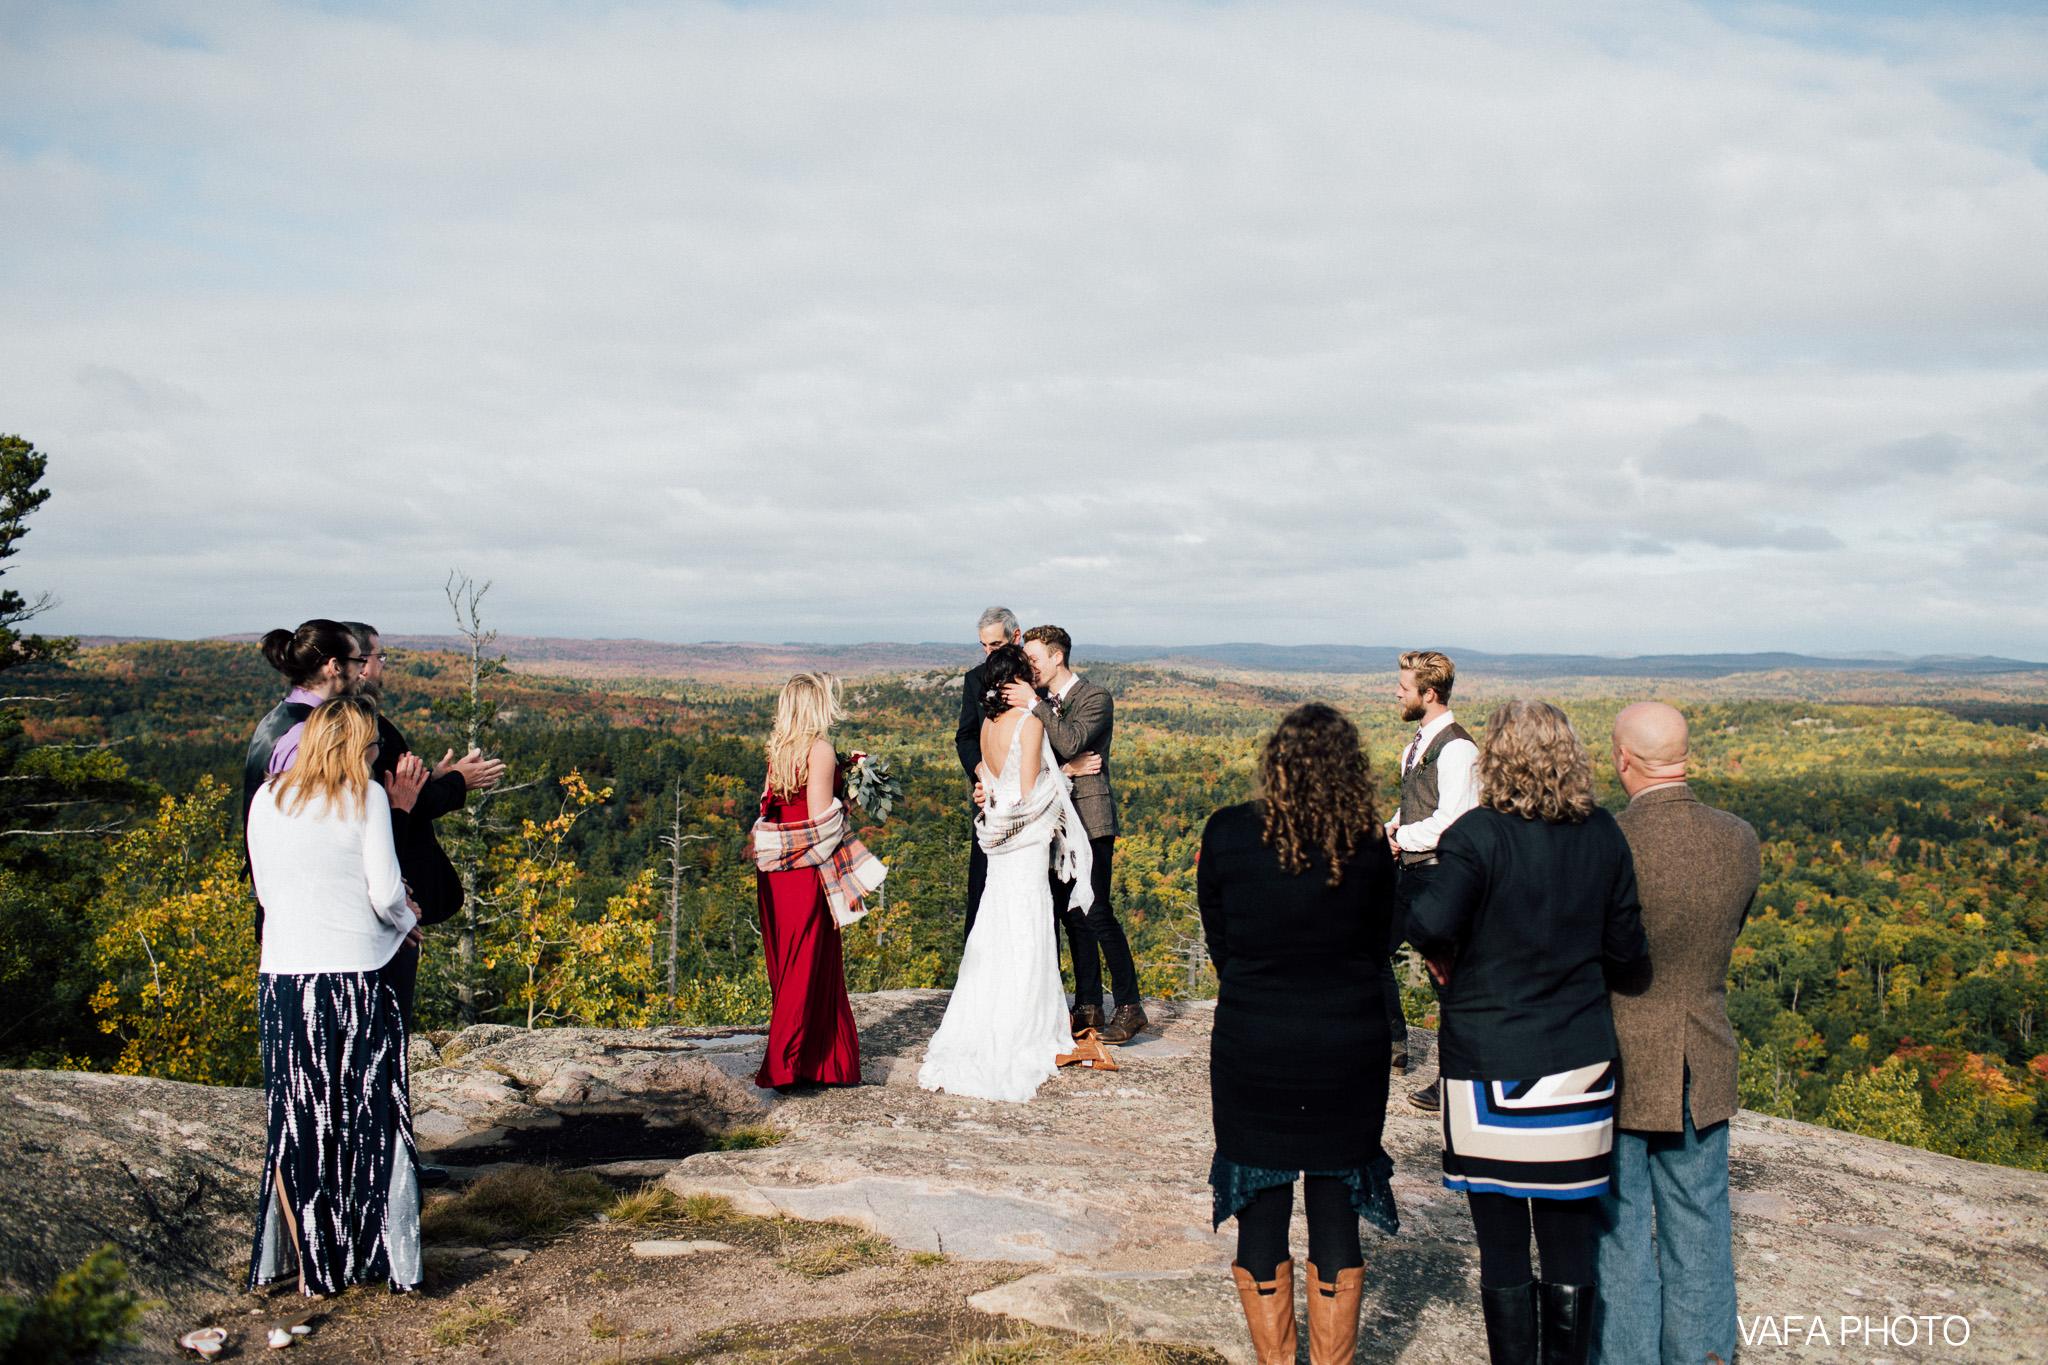 Hogback-Mountain-Wedding-Chelsea-Josh-Vafa-Photo-248.jpg